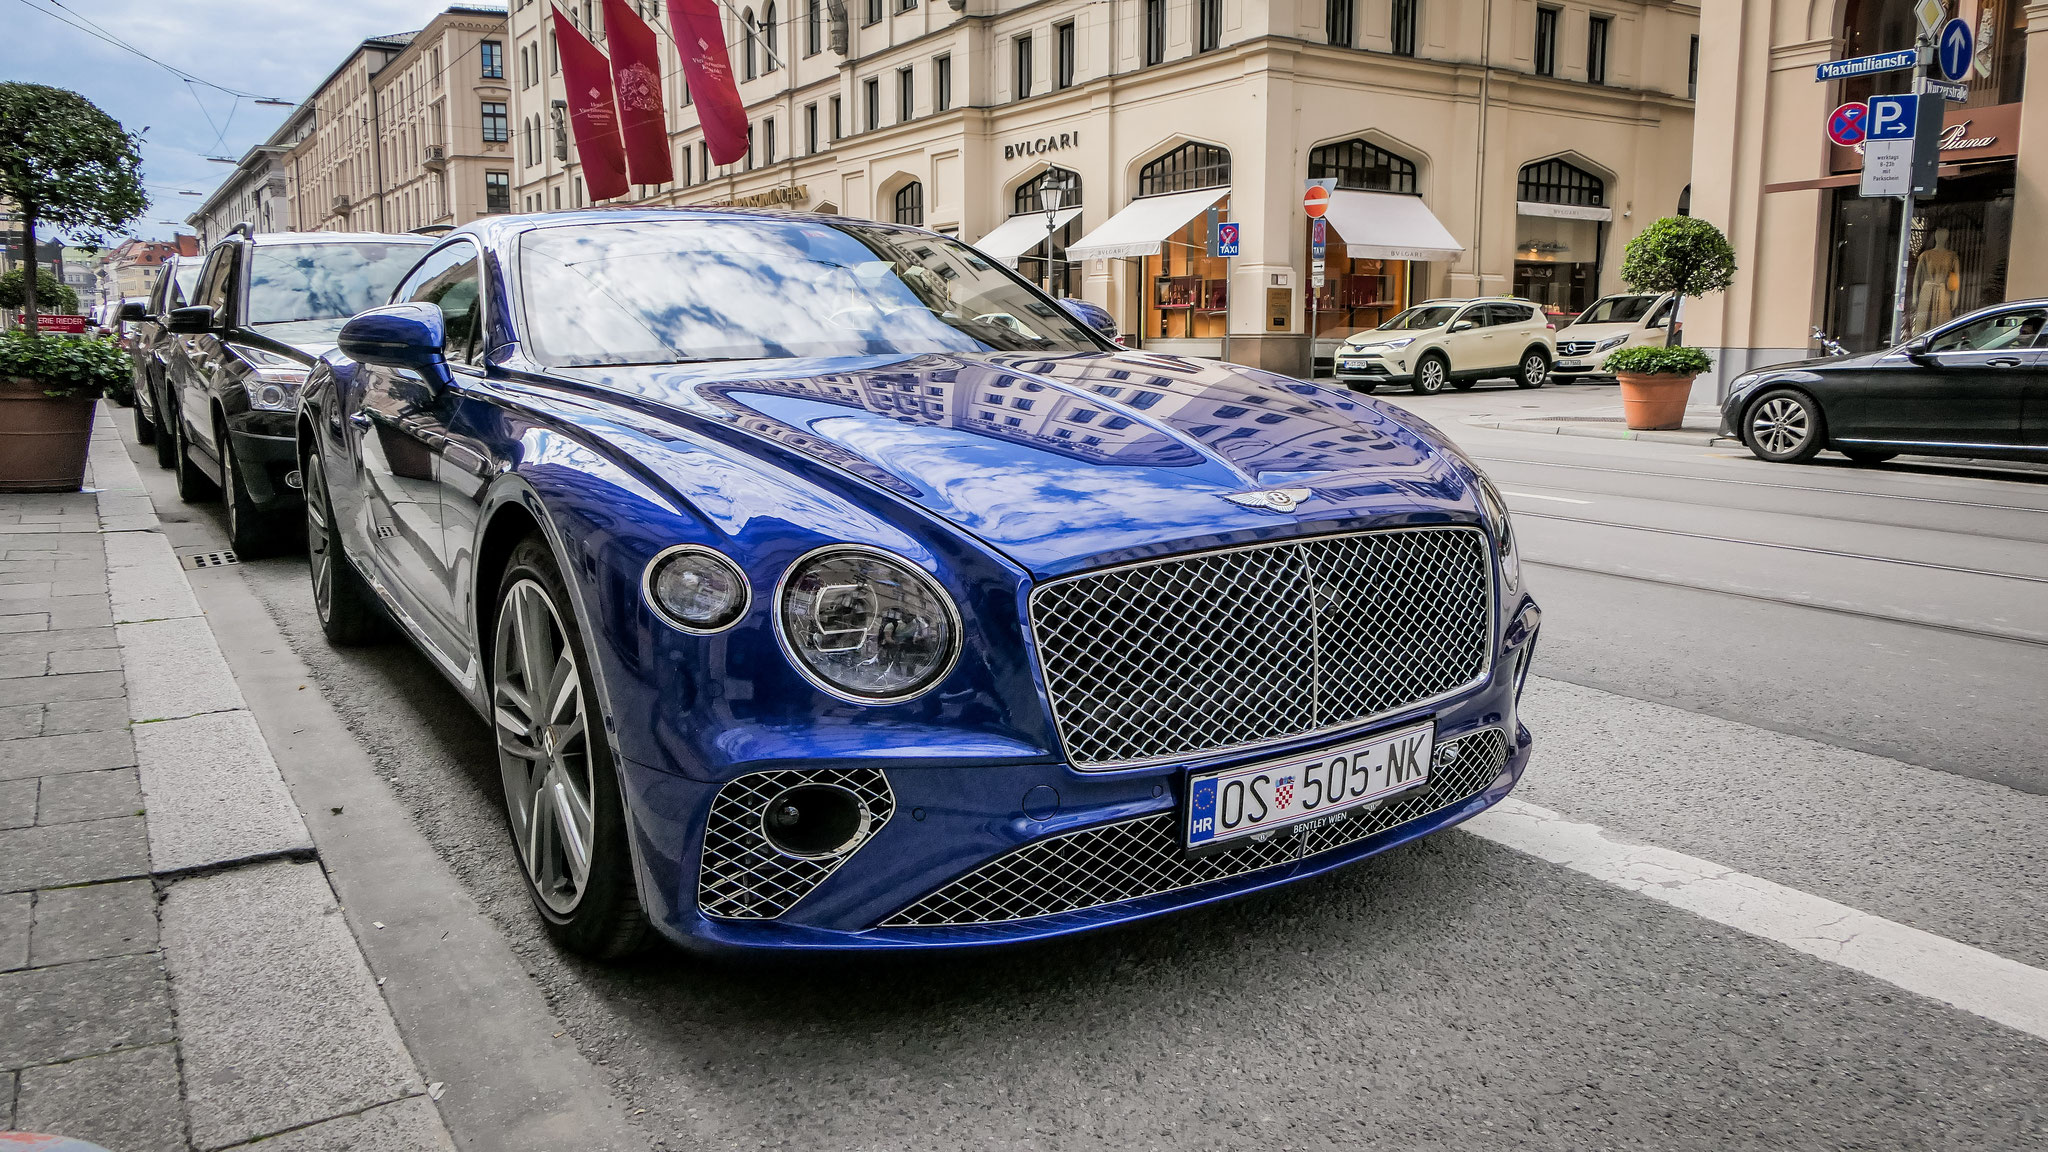 Bentley Continental GT - OS-505-NK (KRO)